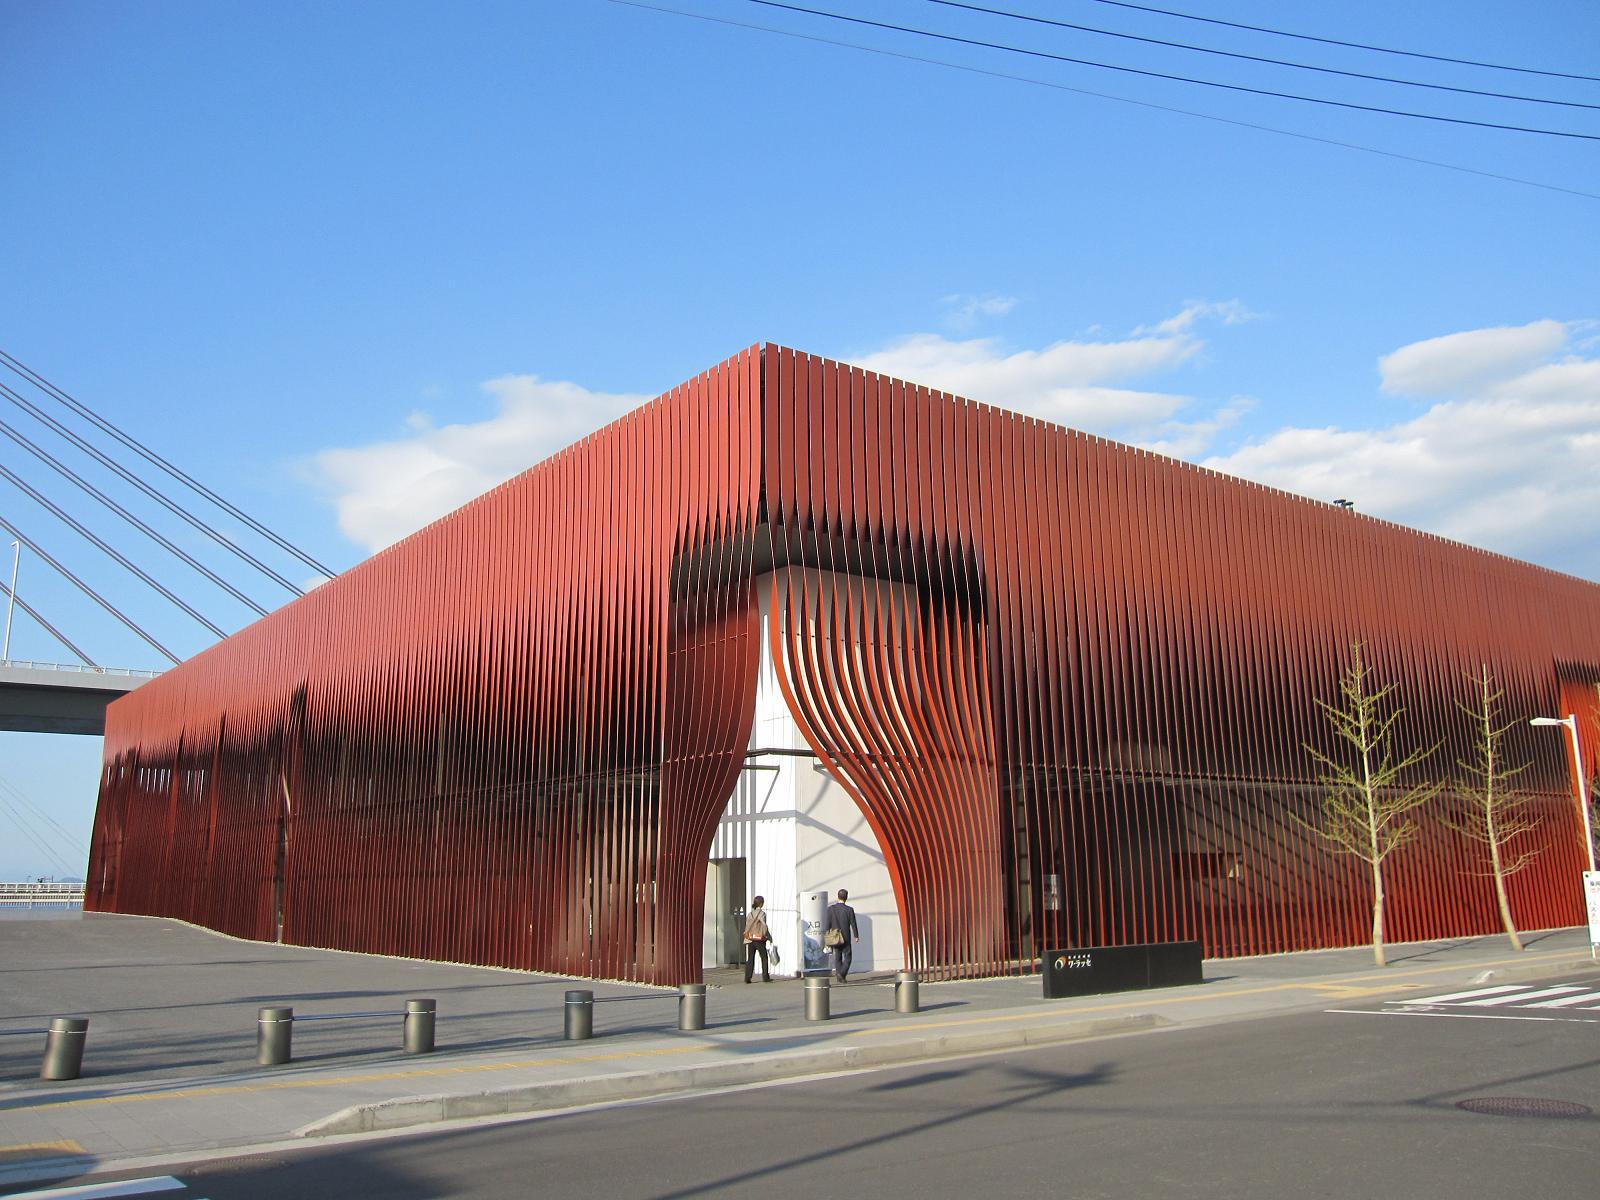 http://upload.wikimedia.org/wikipedia/commons/8/88/Nebuta_house_Wa-Rasse.JPG